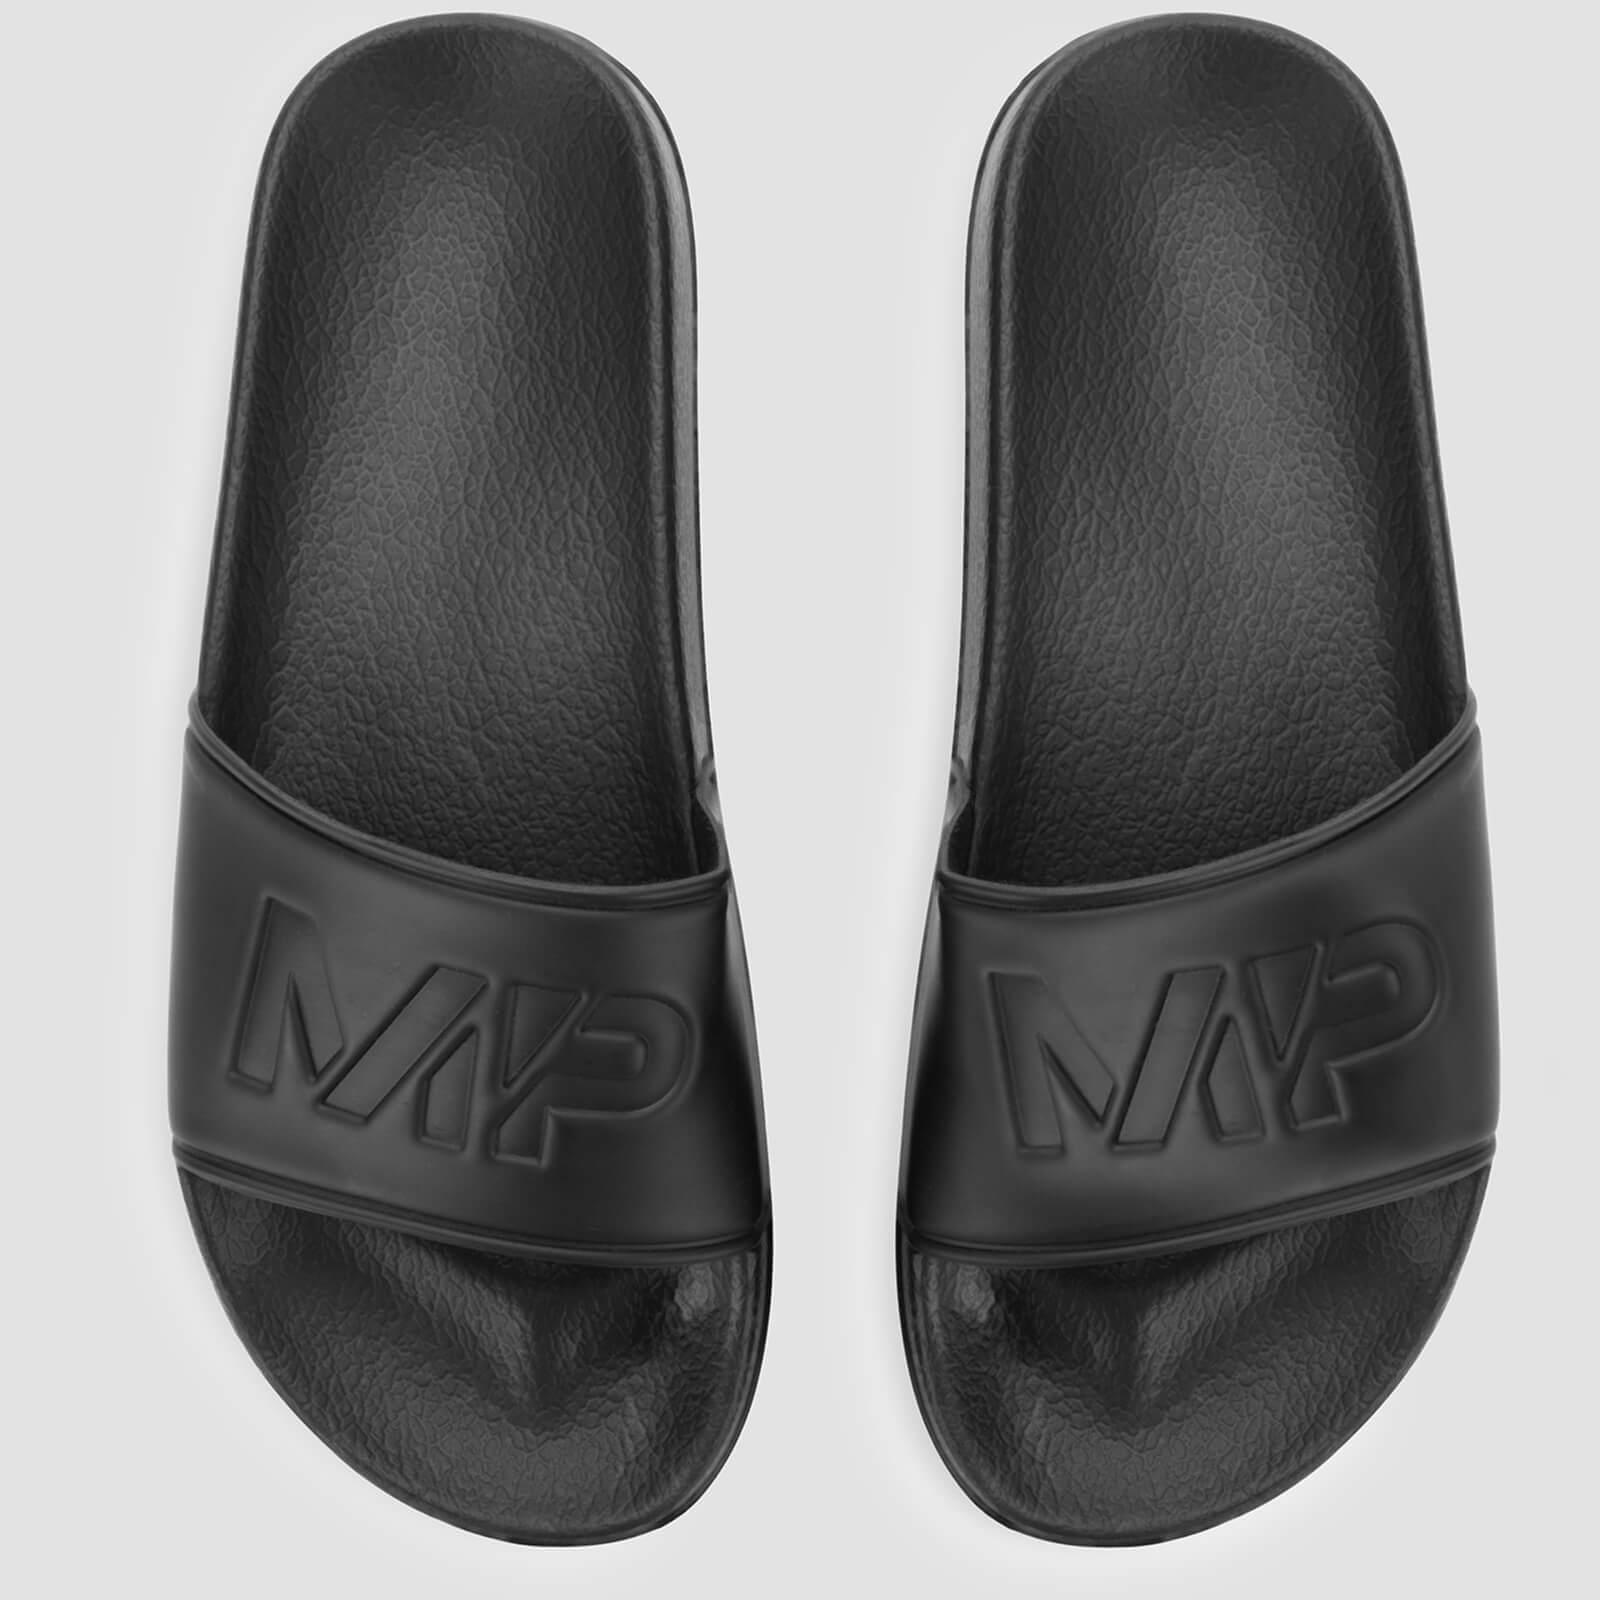 Myprotein MP Men's Sliders - Black - UK 6